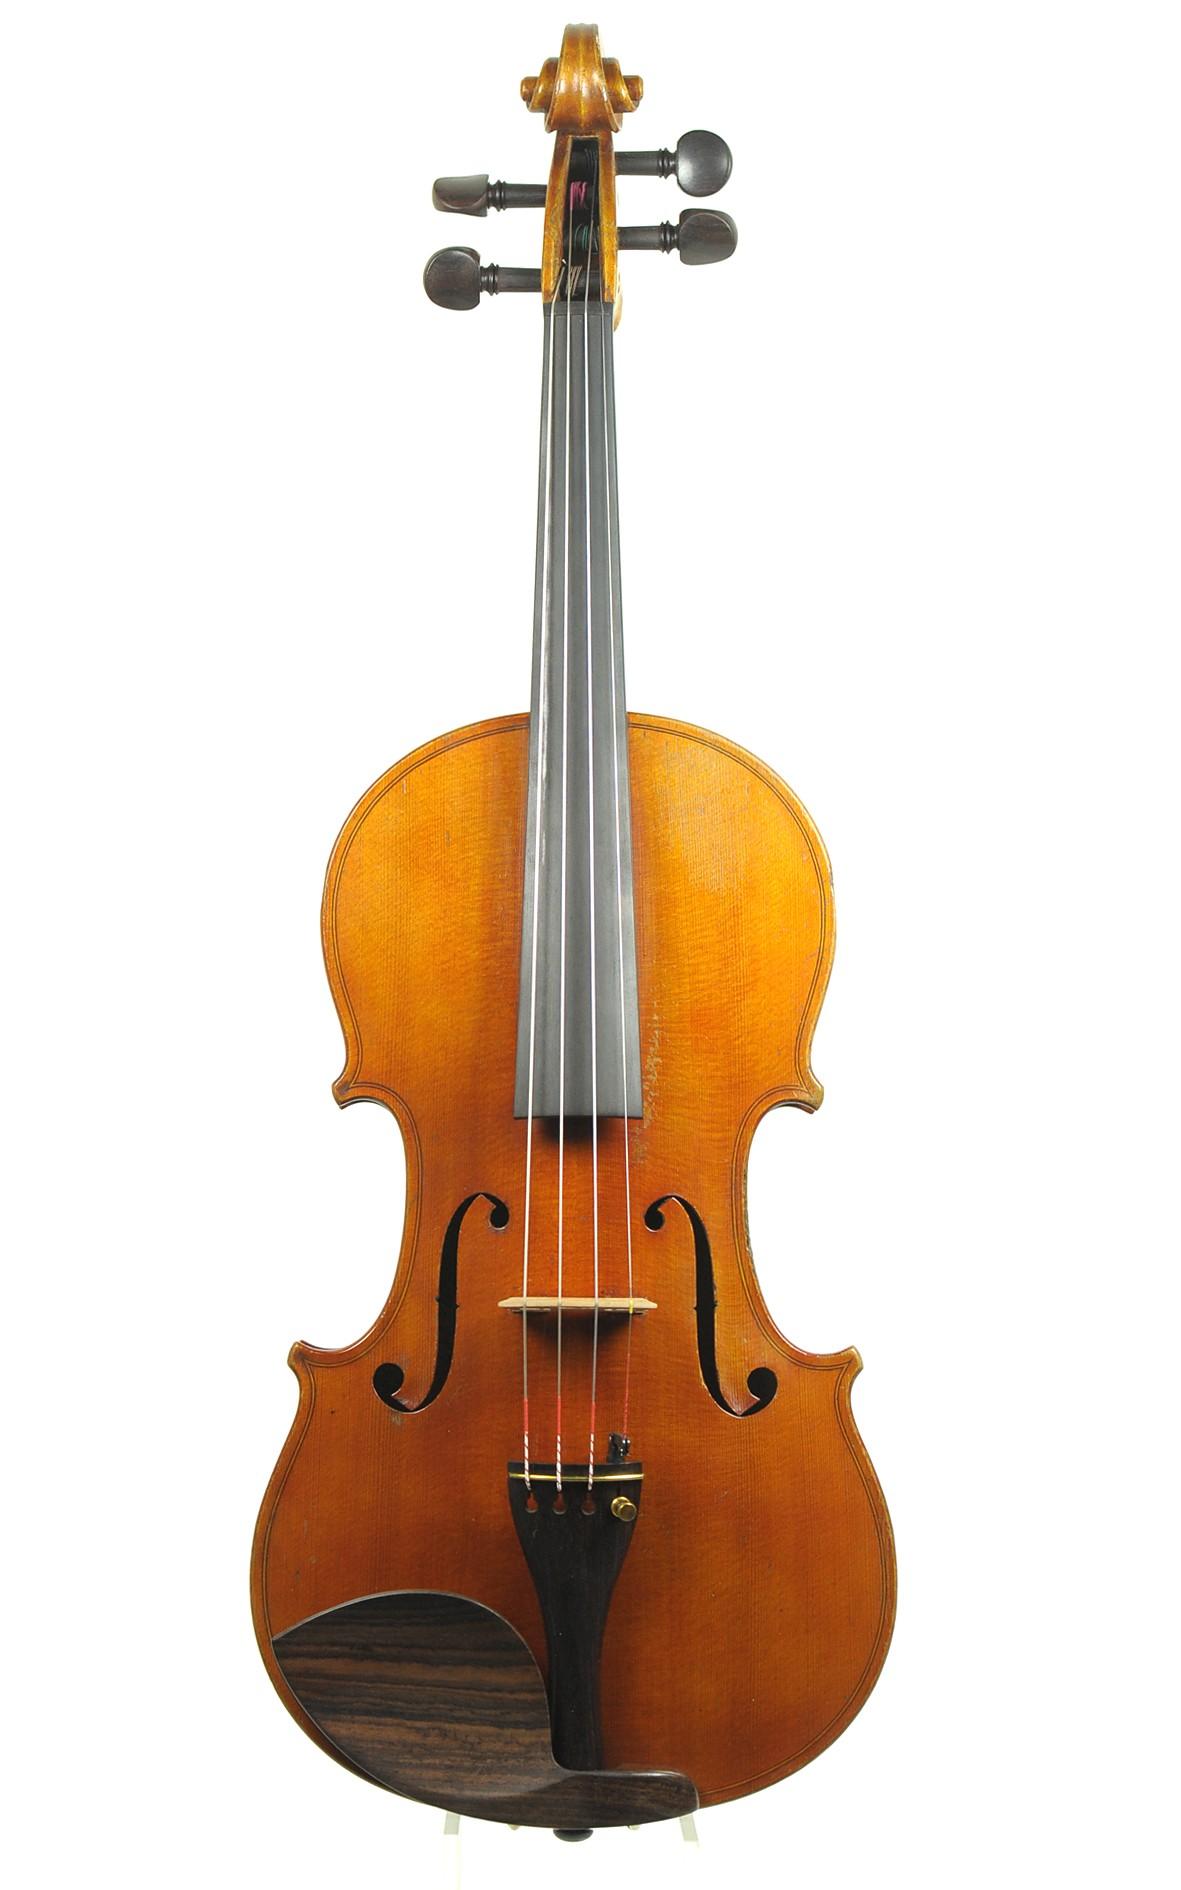 Fine Düsseldorf violin by Louis Otto, made 1892, No. 157 - spruce top